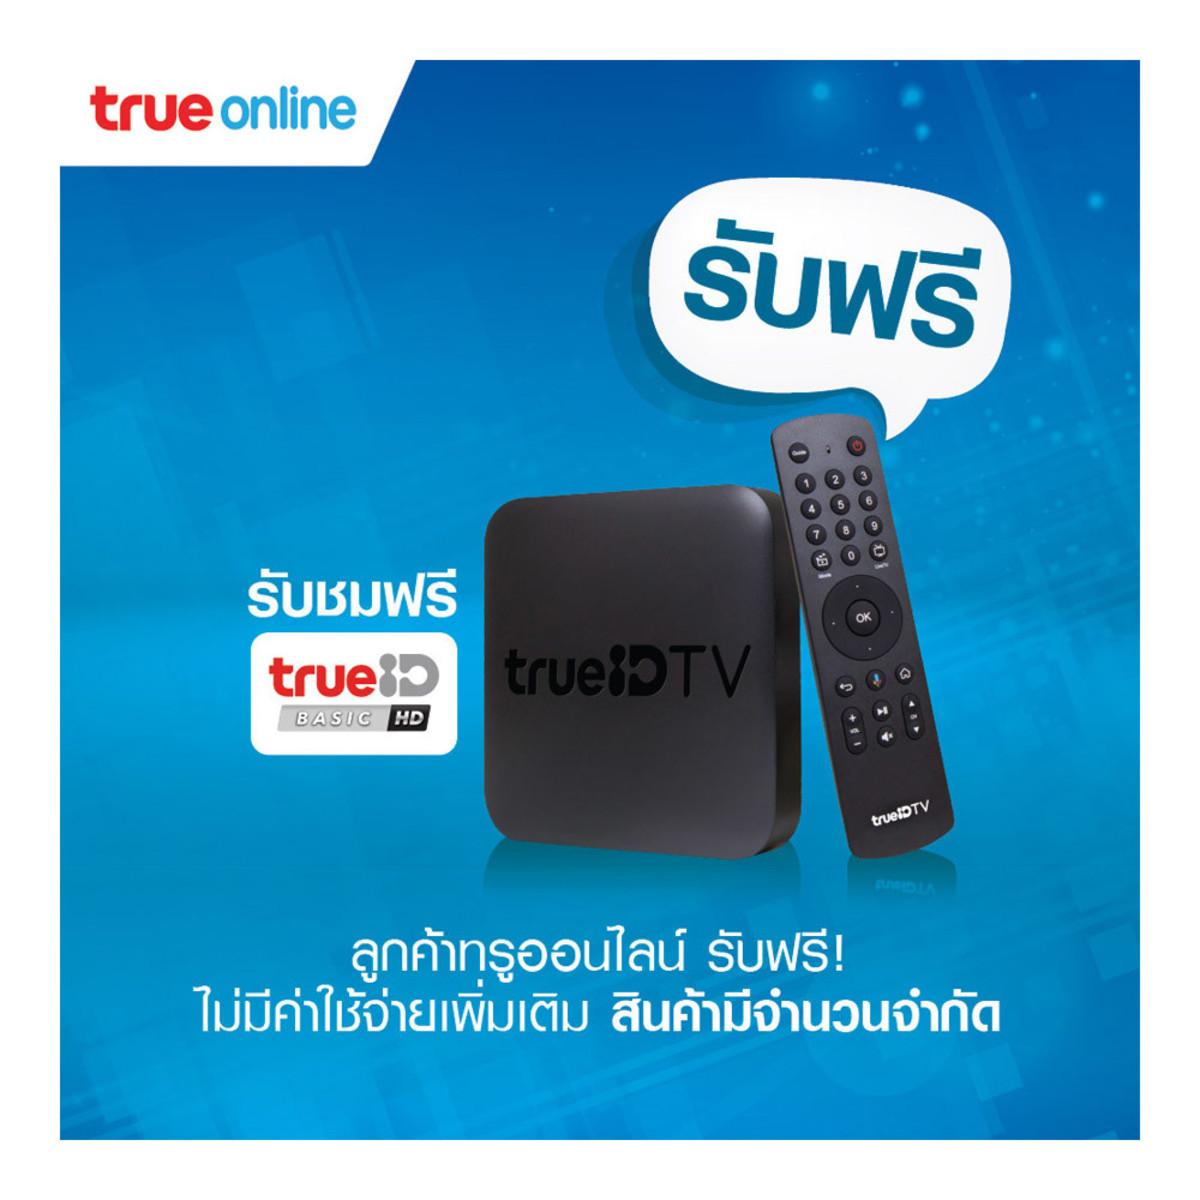 TrueID TV Free for TrueOnline